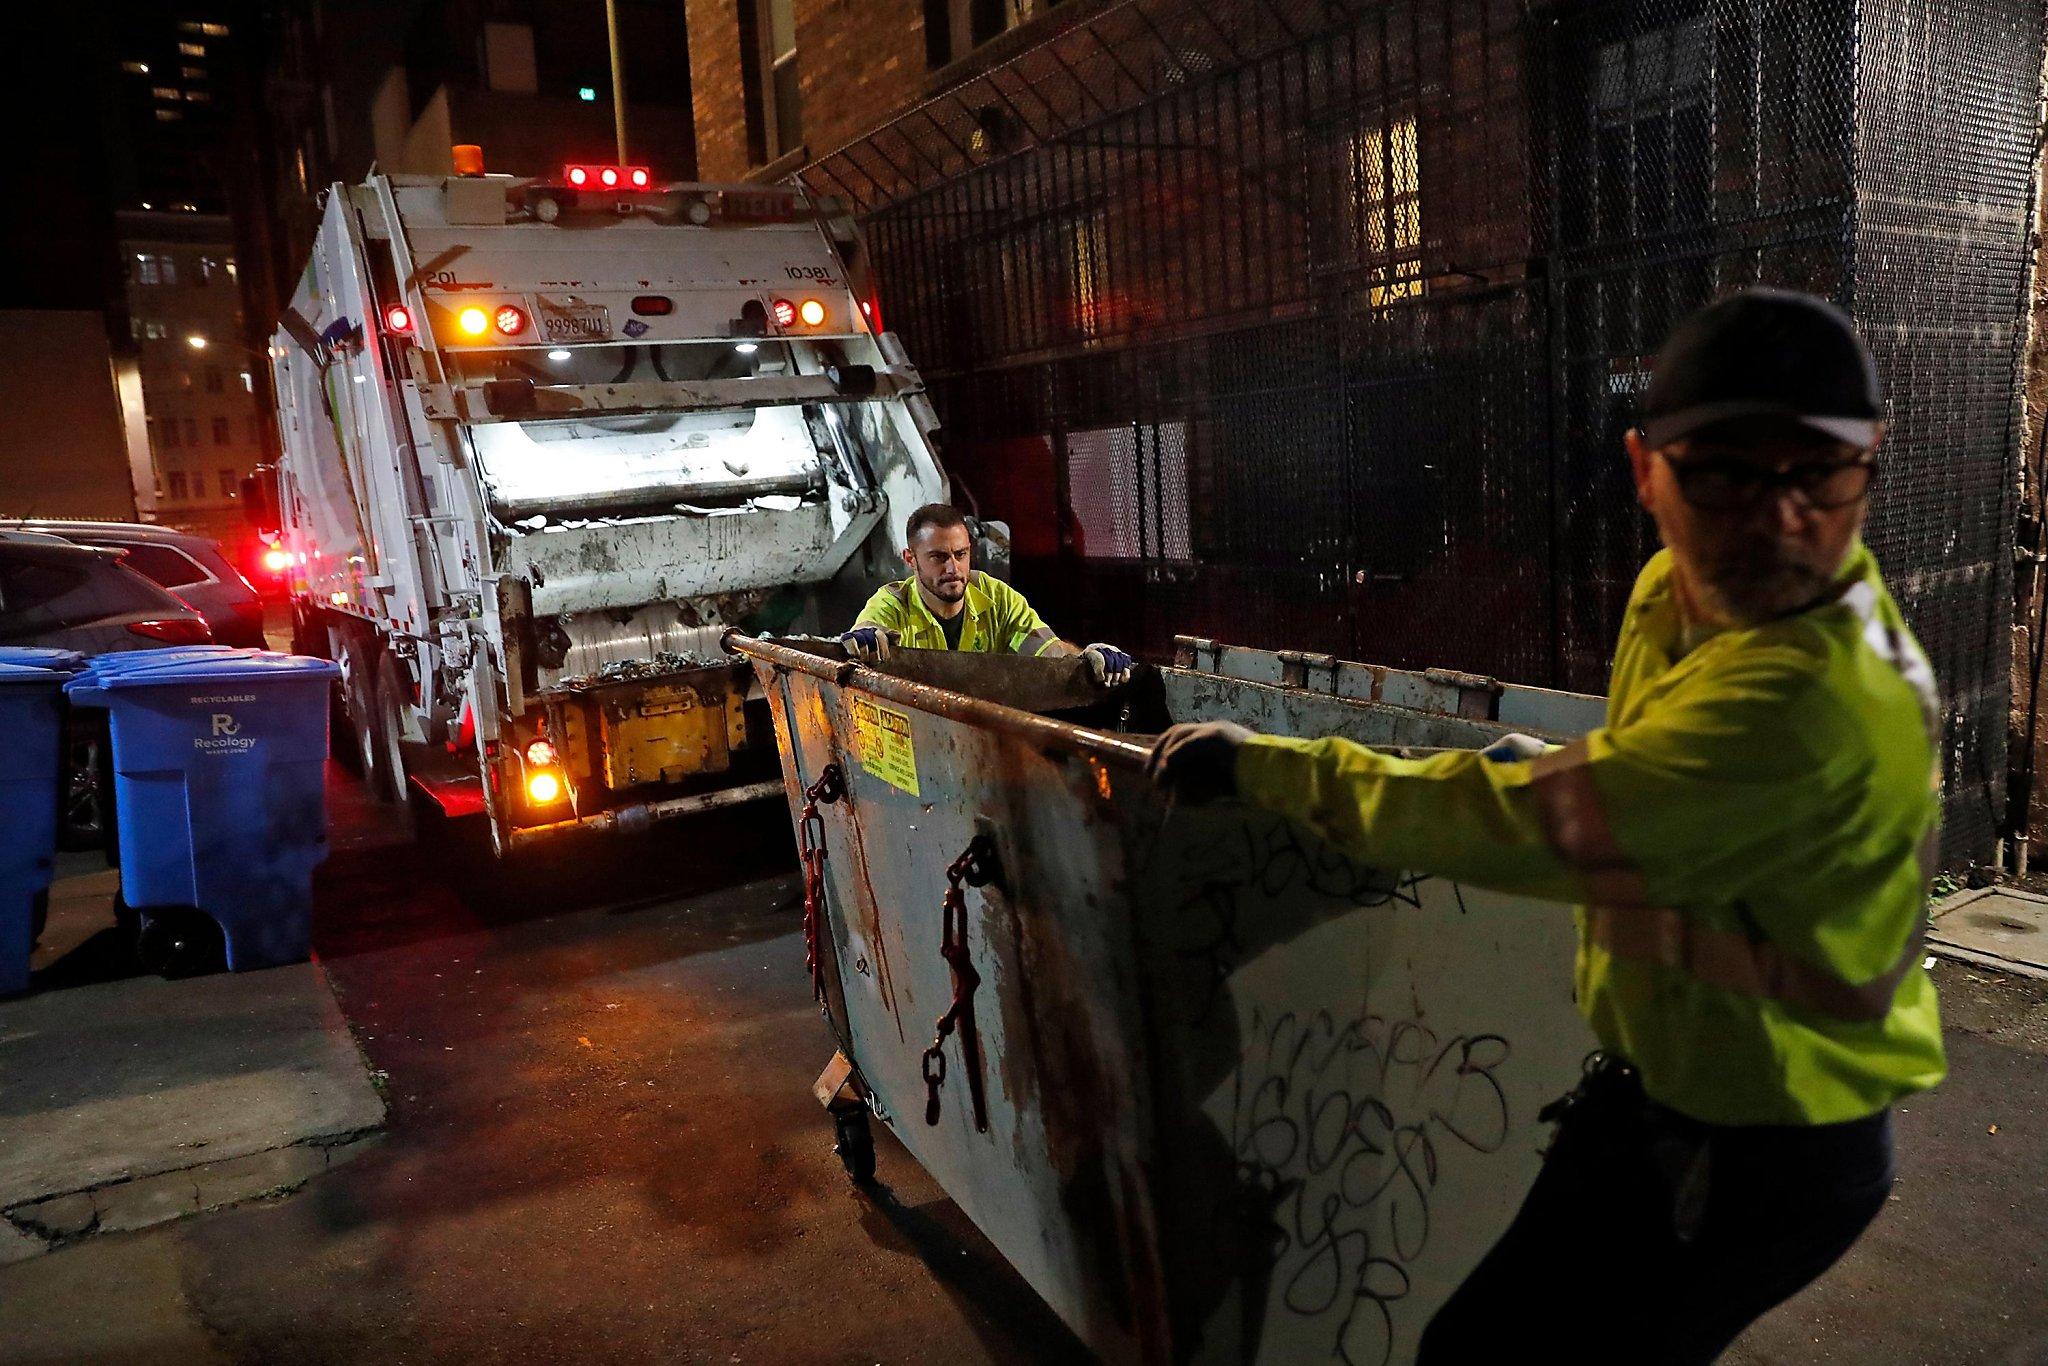 Toughest job in SF? Tenderloin garbagemen work late at ...